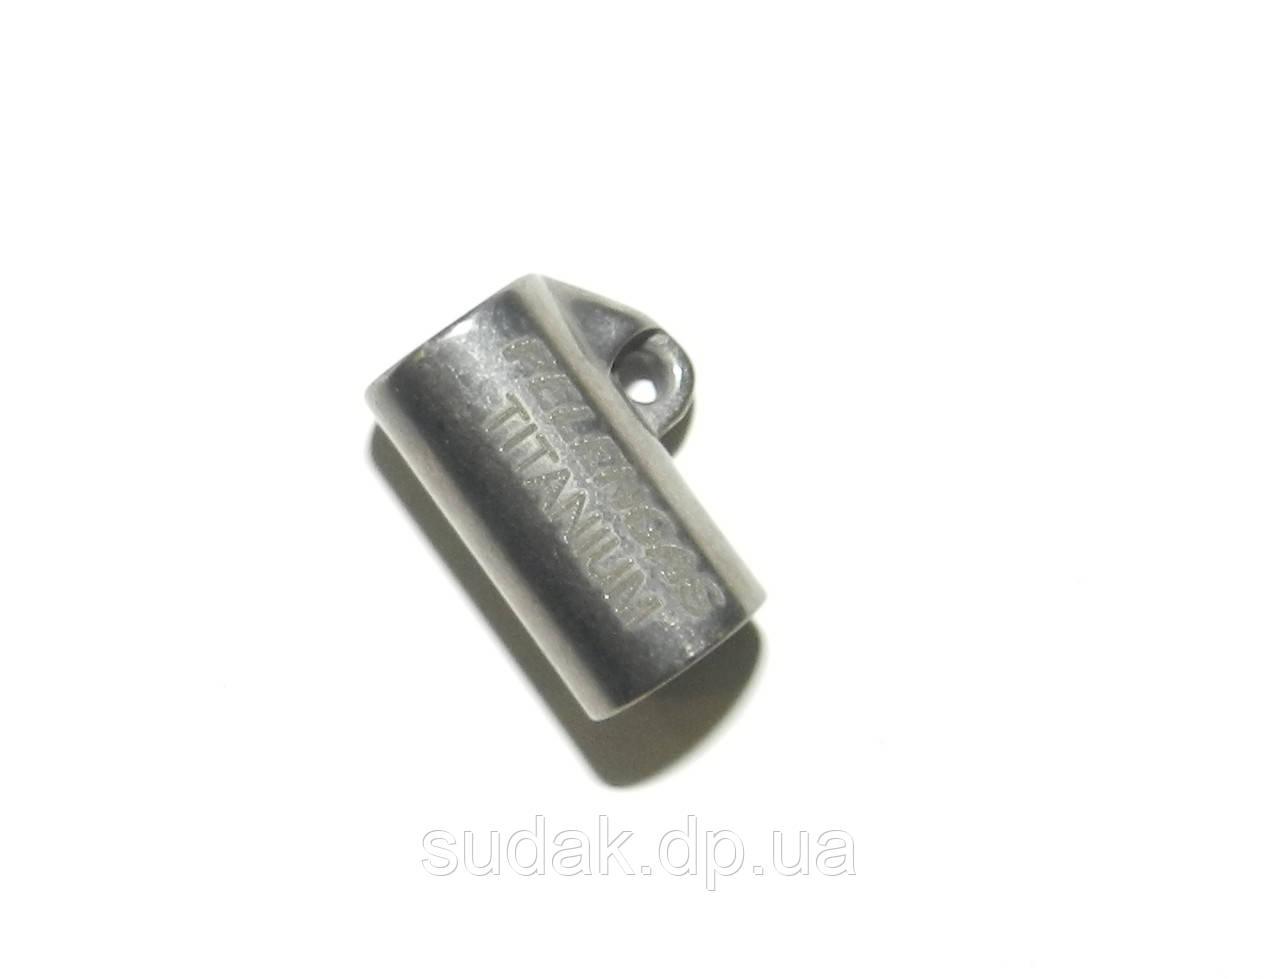 PELENGAS Скользящая втулка Titanium с гидротормозом 7,5 мм